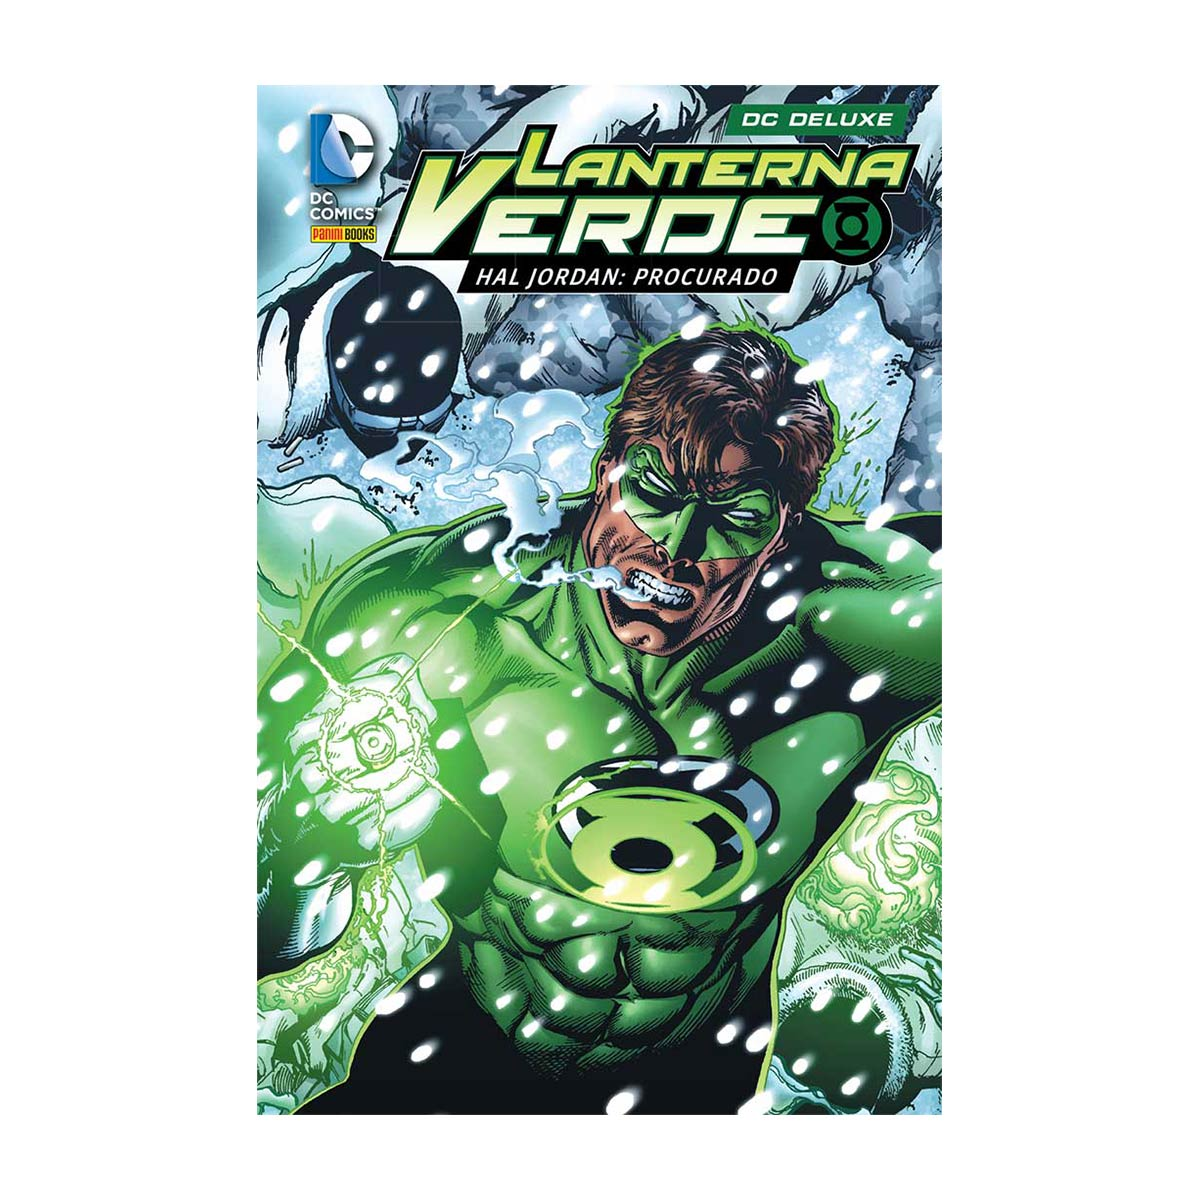 Graphic Novel Lanterna Verde Hal Jordan: Procurado